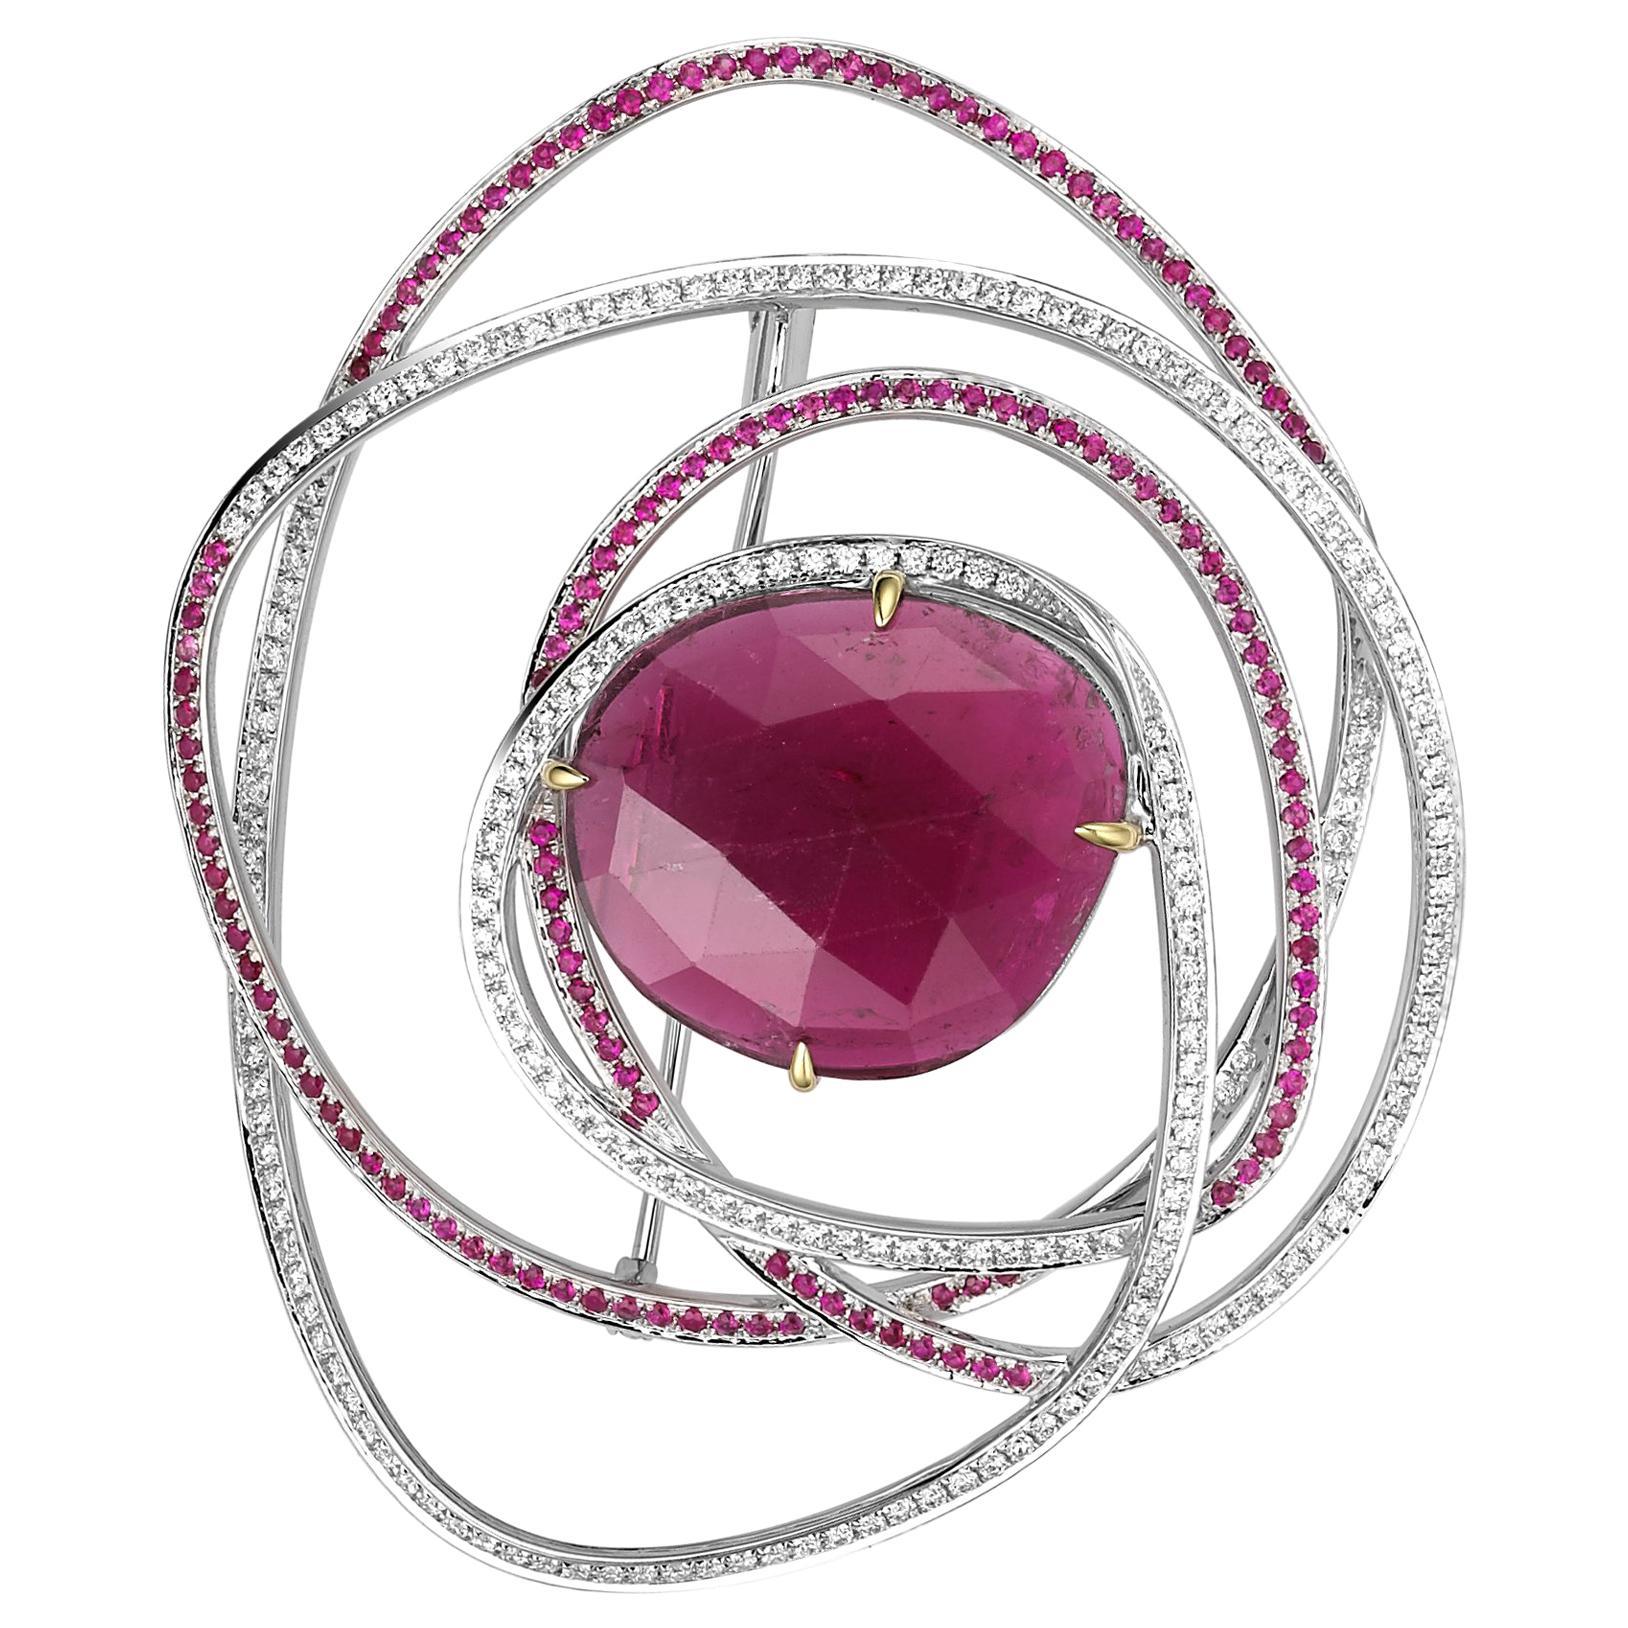 Fei Liu Rubellite Diamond Pink Sapphire 18 Karat White Gold Modern Rose Brooch